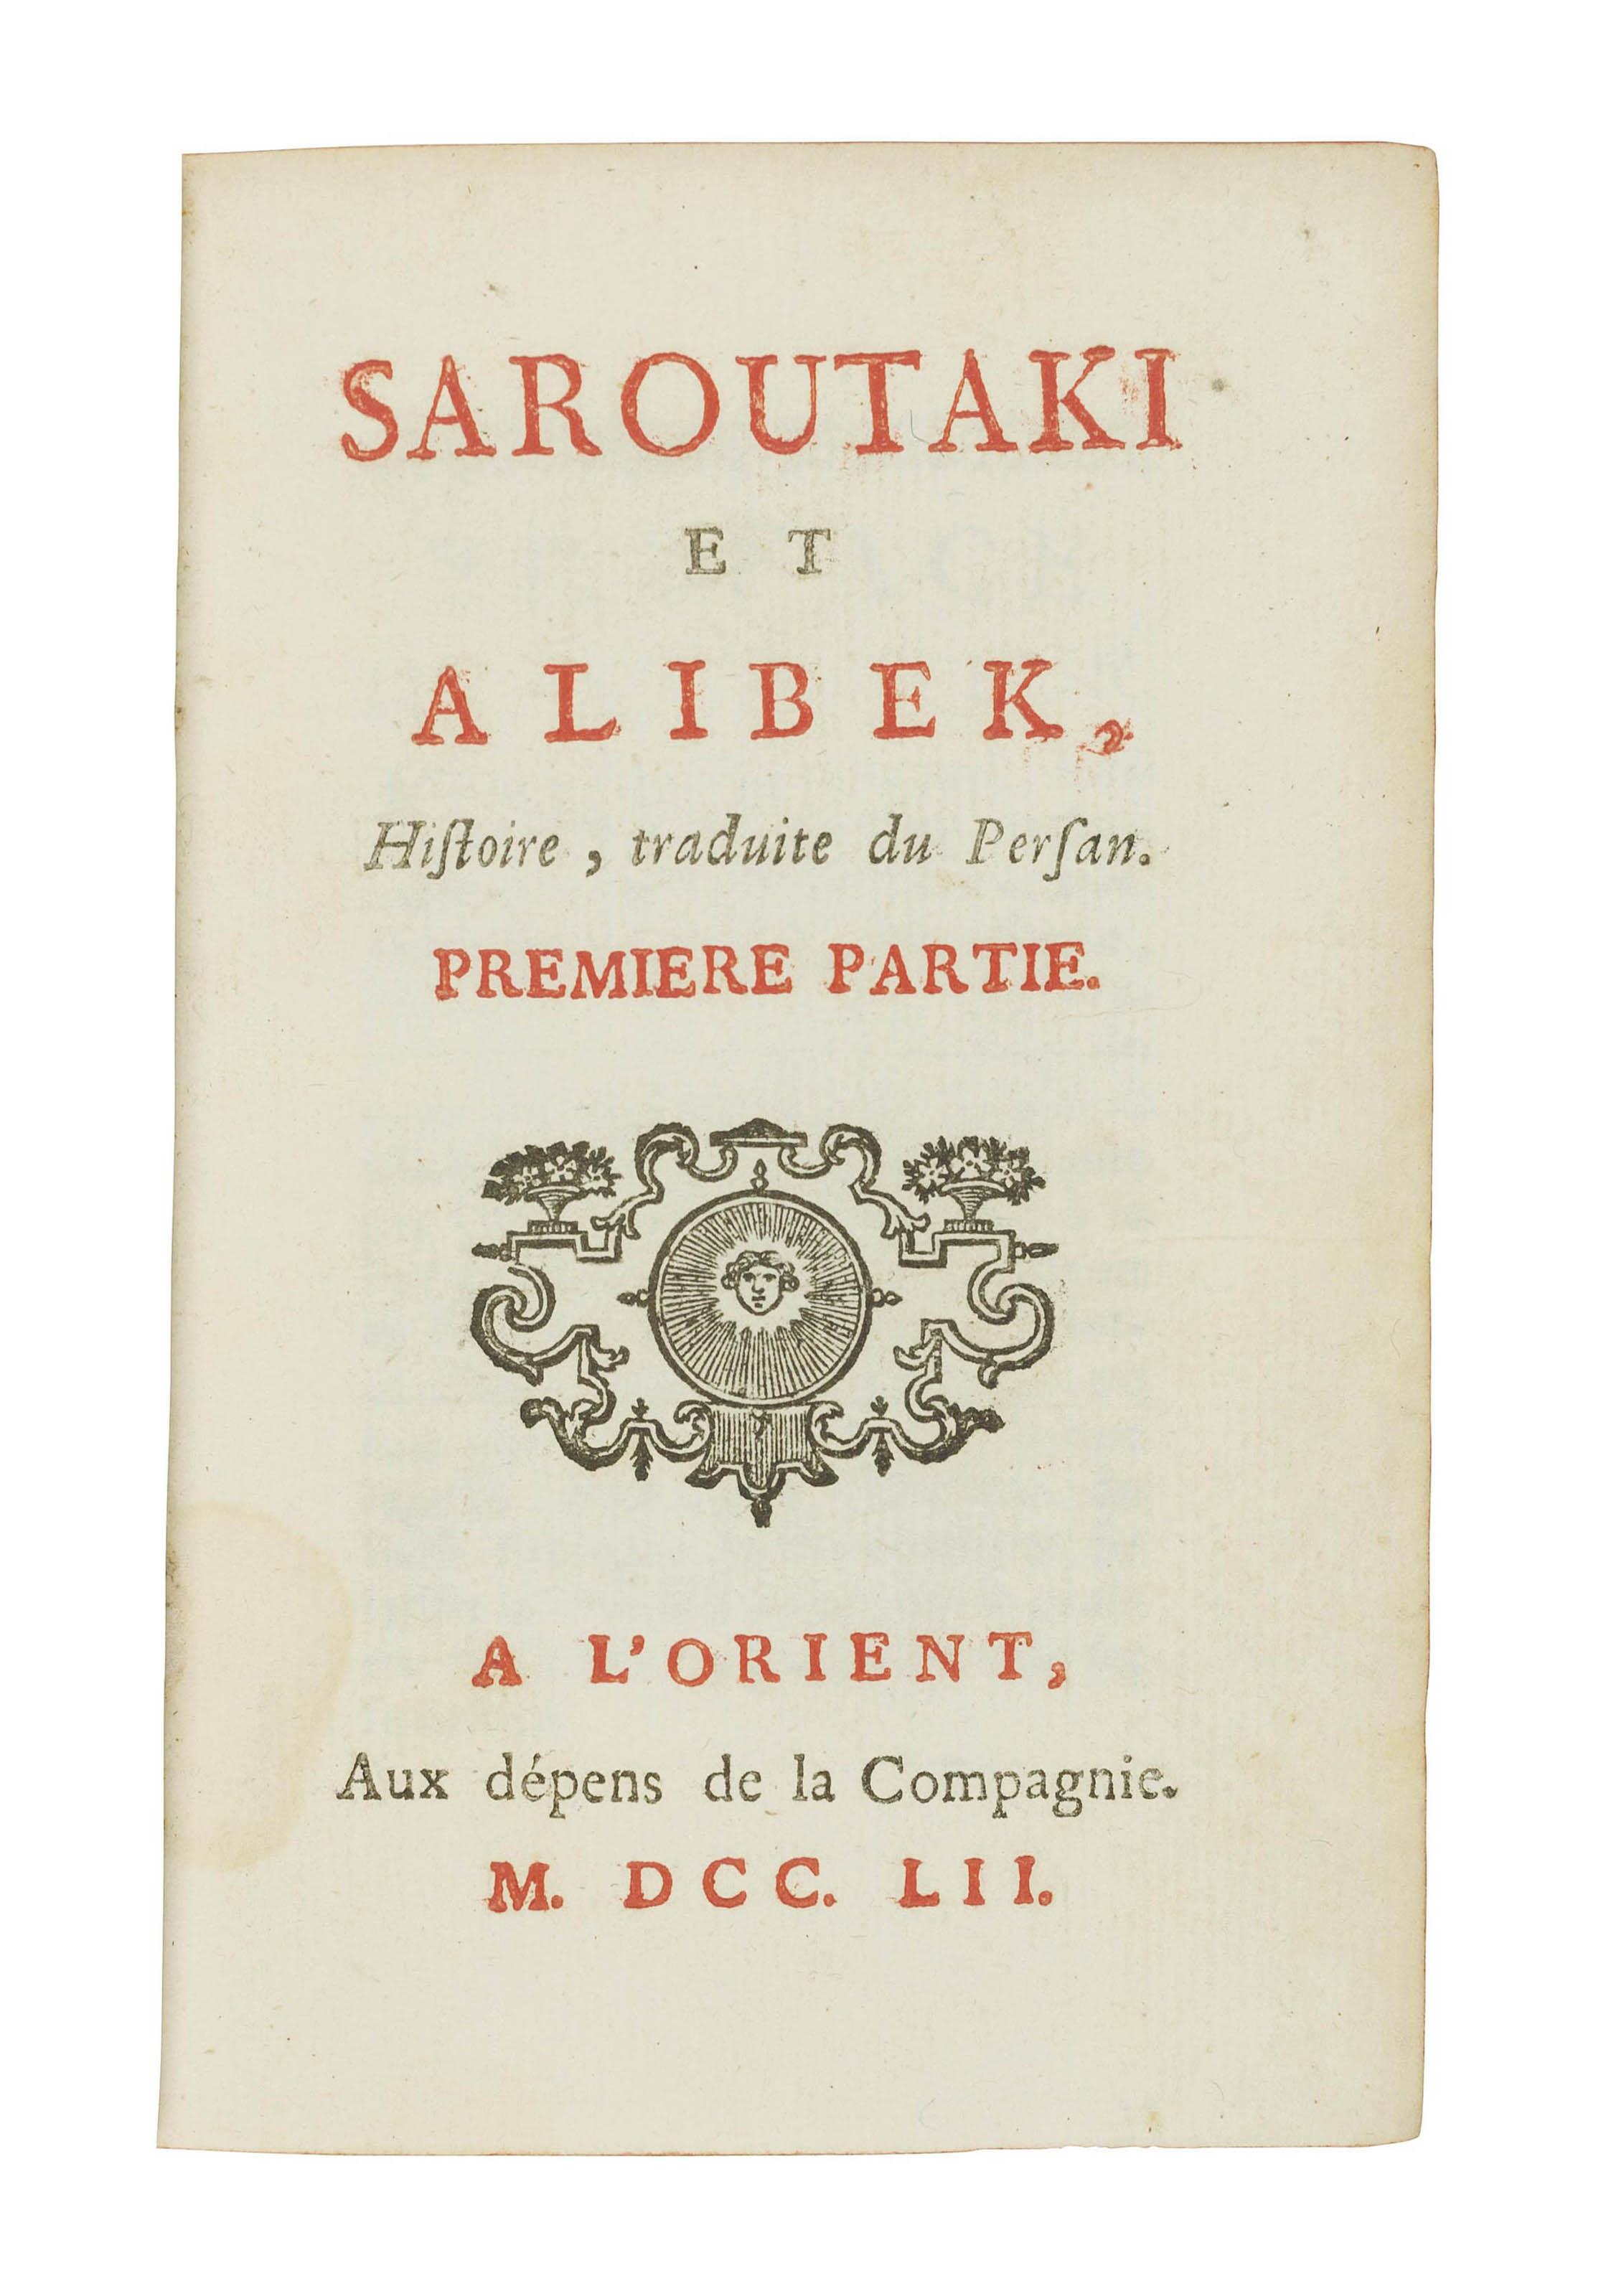 Saroutaki et Alibek, histoire,